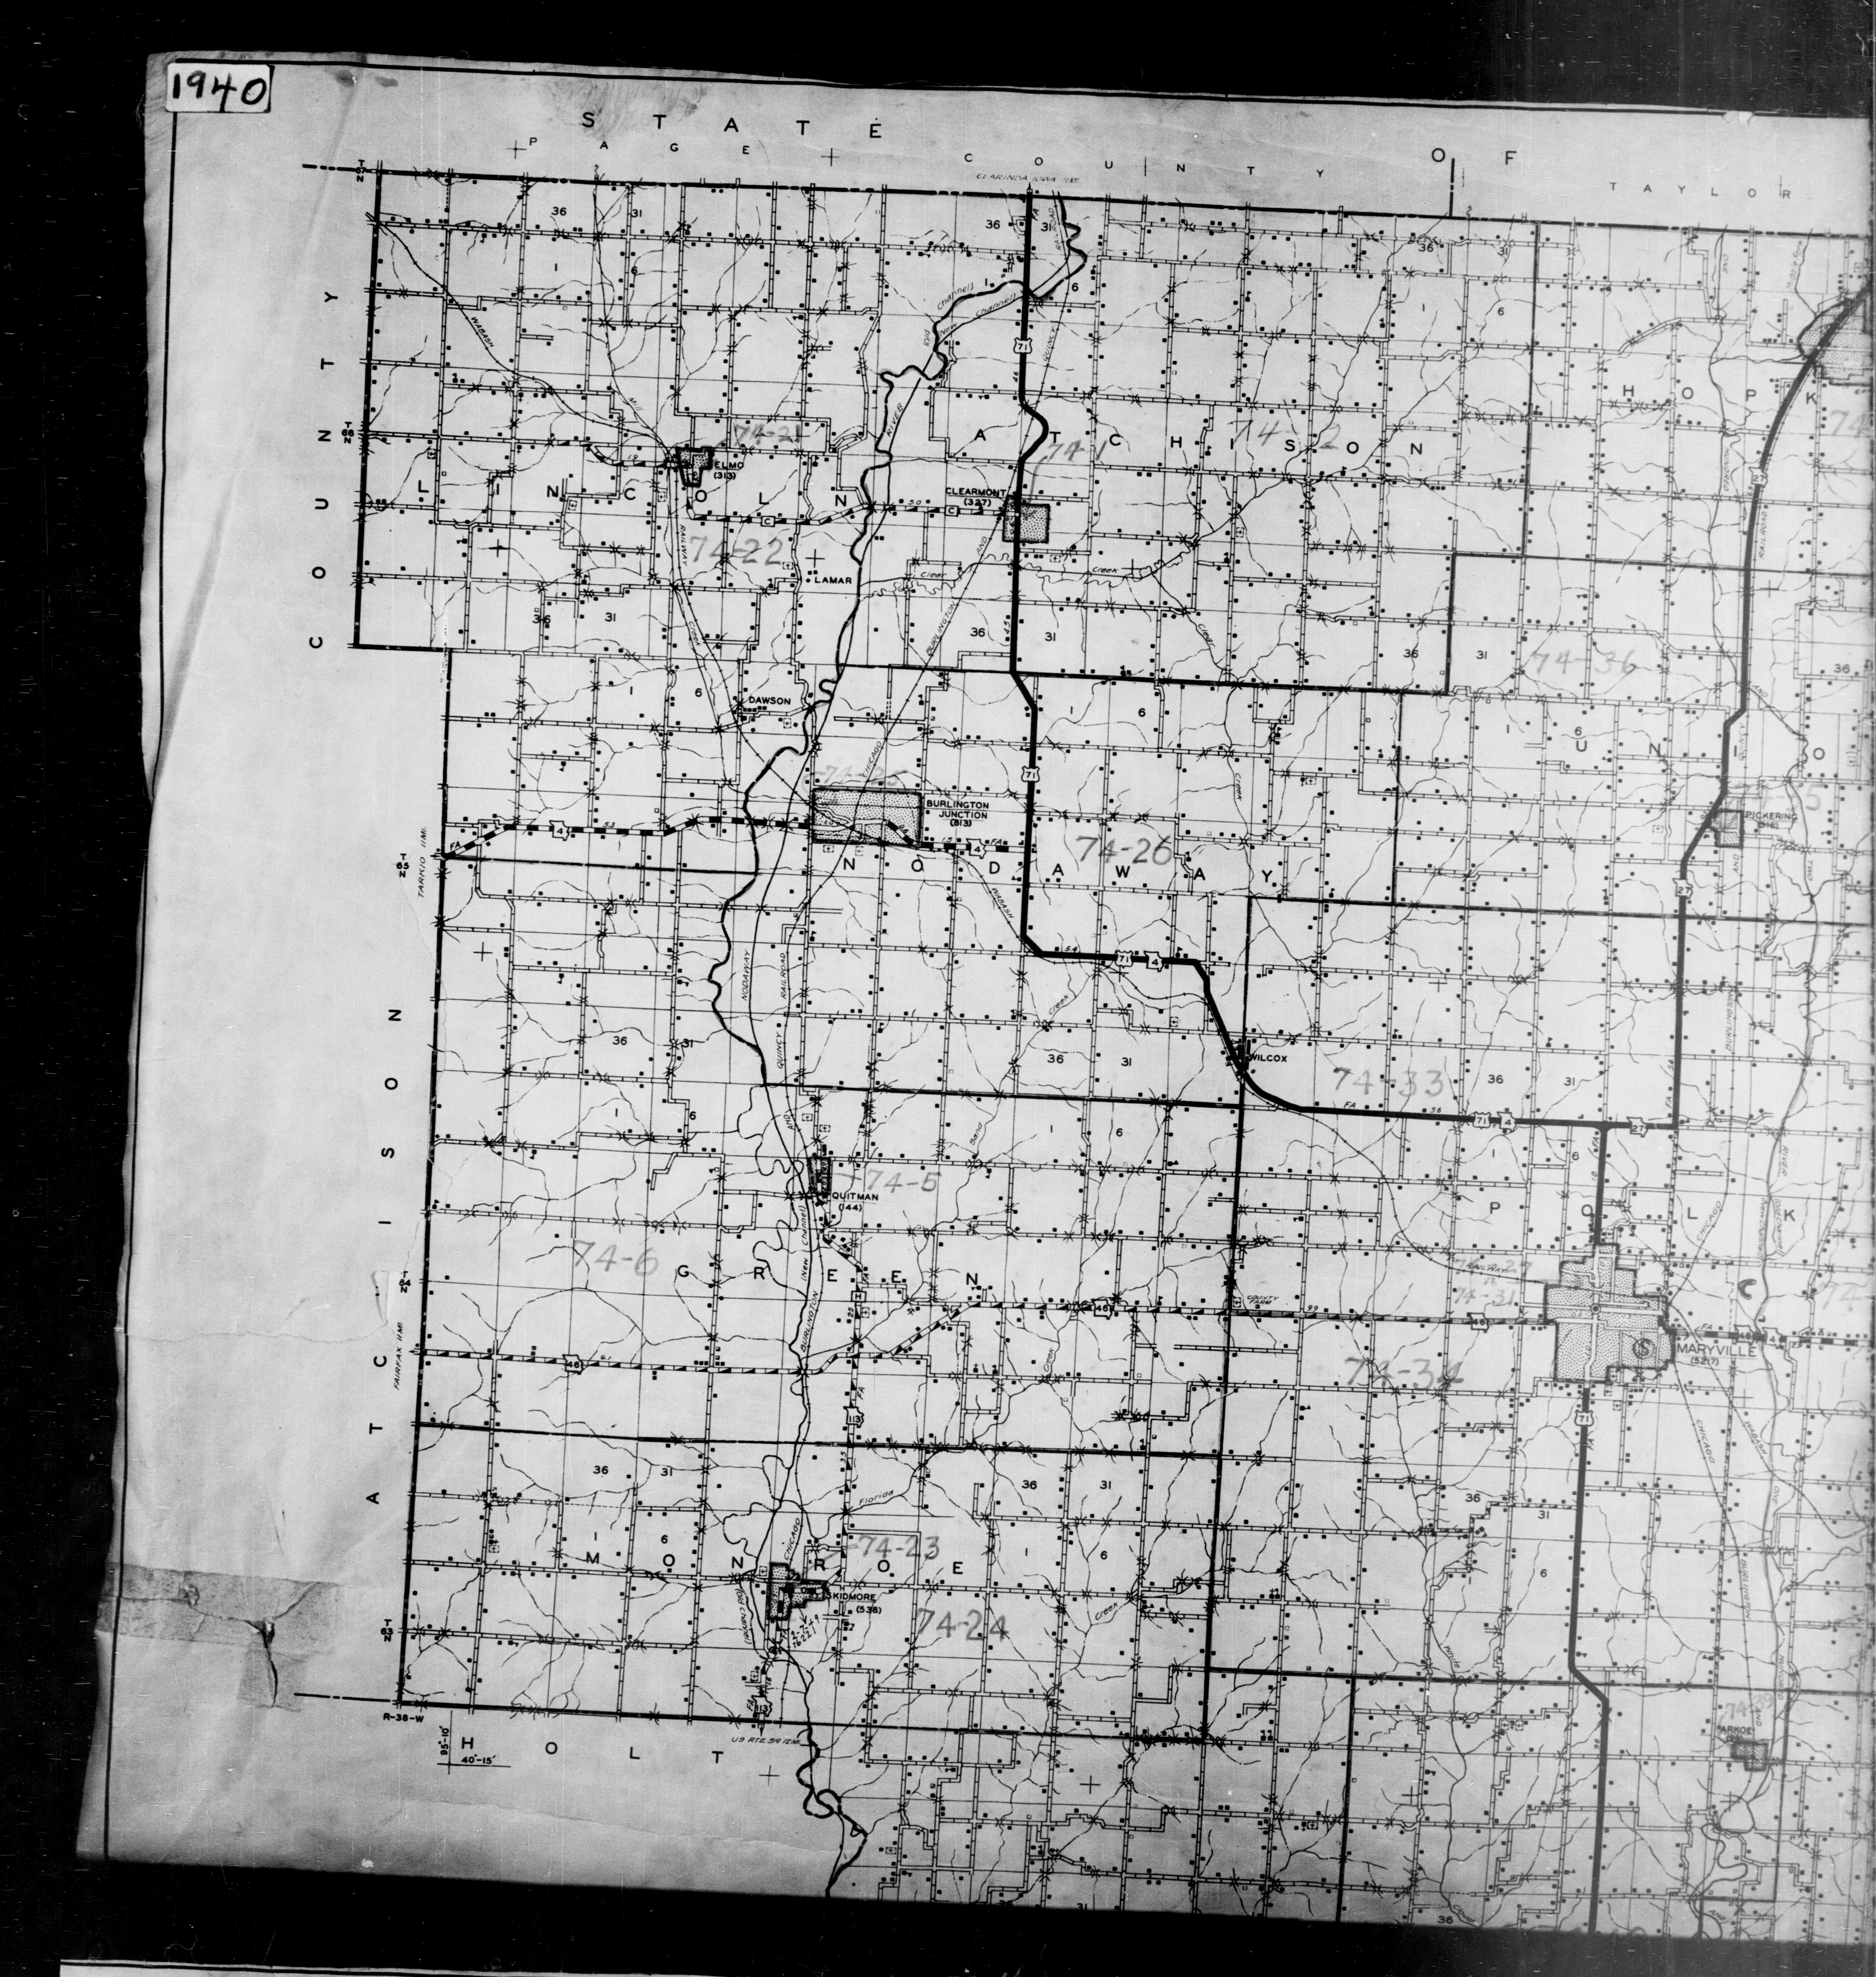 1940 Census Enumeration District Maps - Missouri - Nodaway County - ED 74-1 - ED 74-40